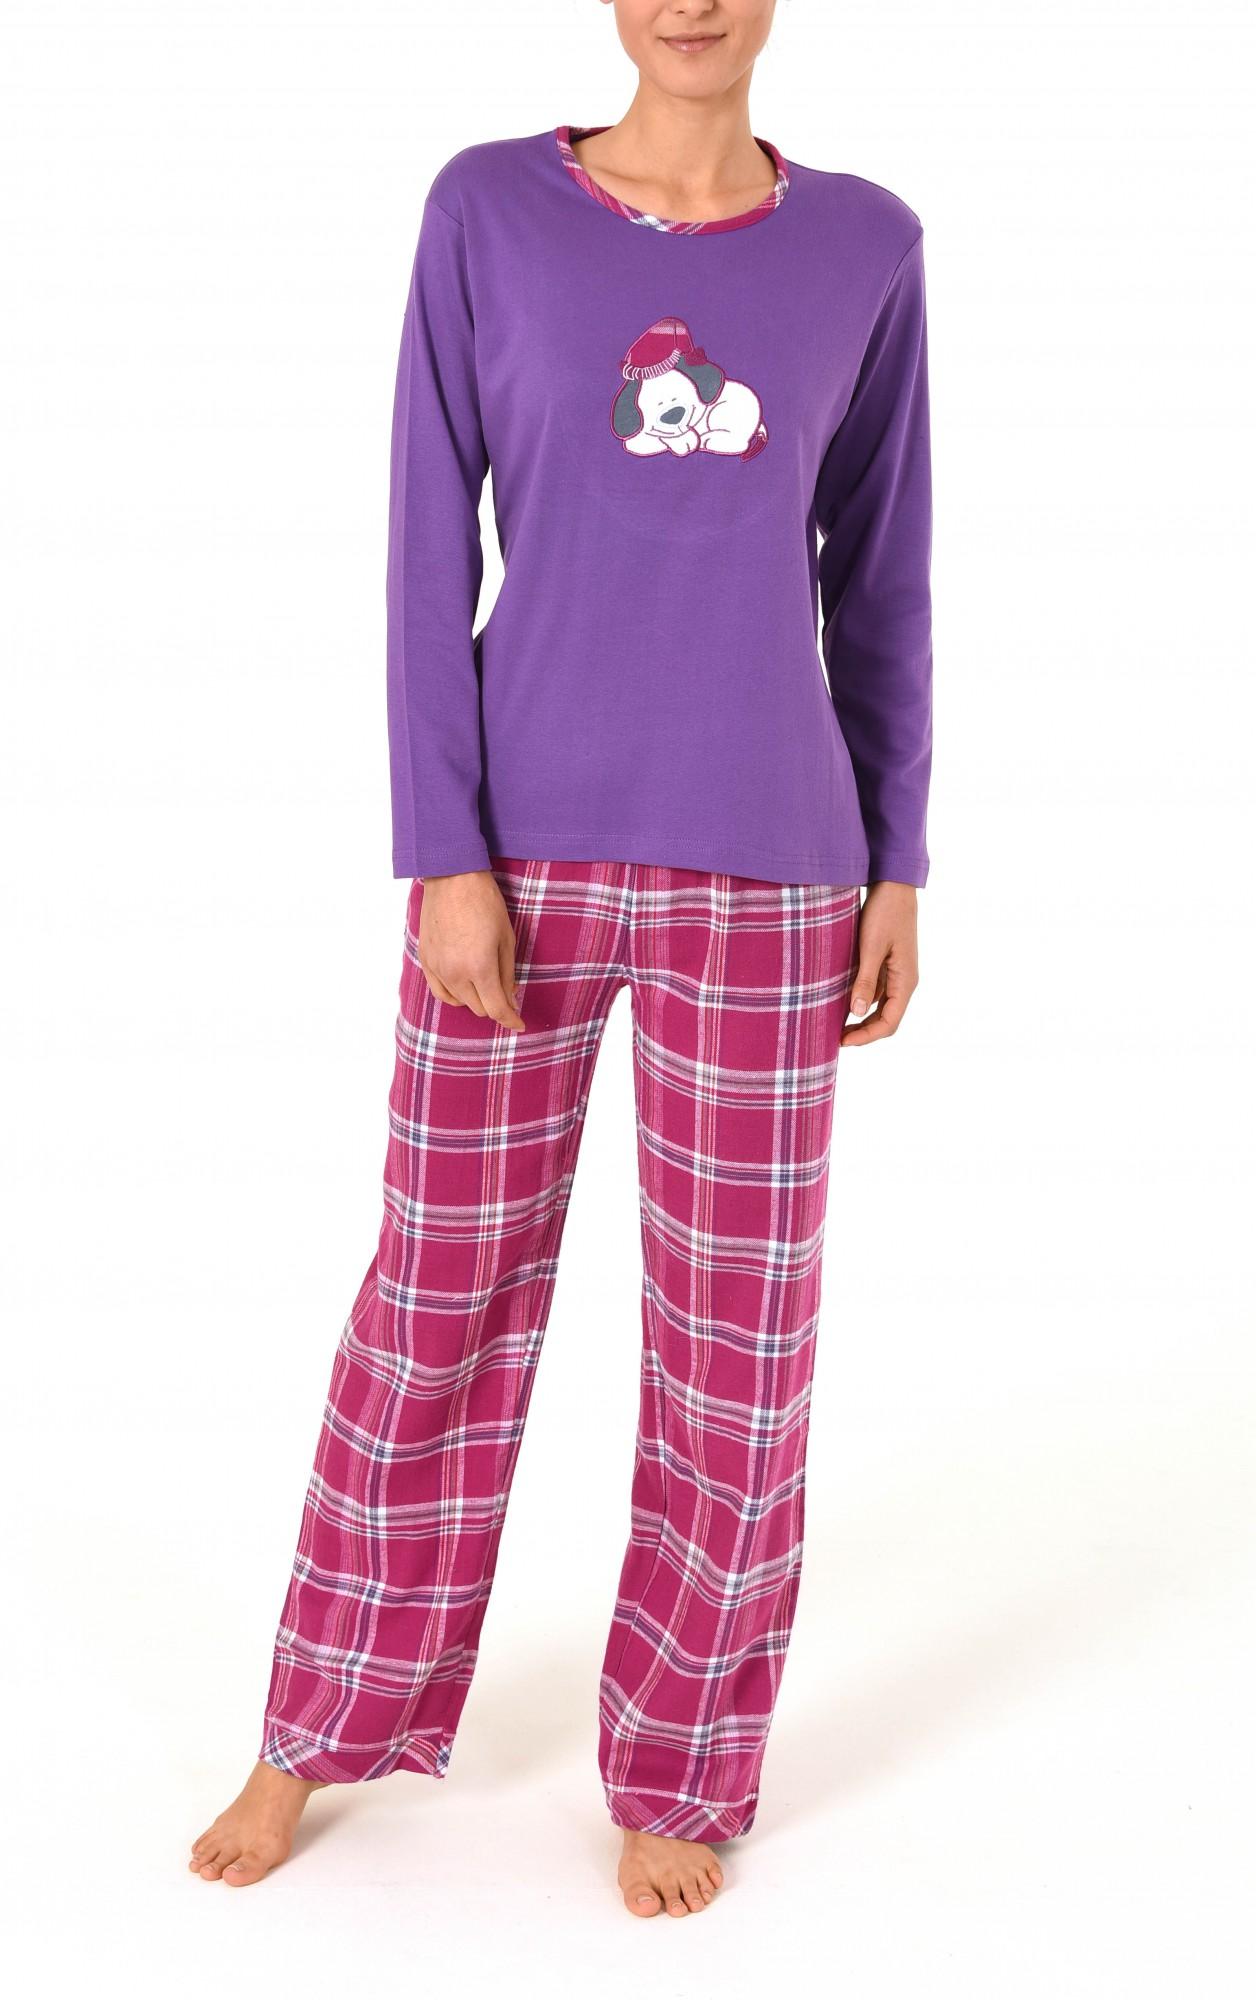 Damen Flanell Pyjama Mix & Match – Hose Flanell Oberteil Interlock  – Bild 2